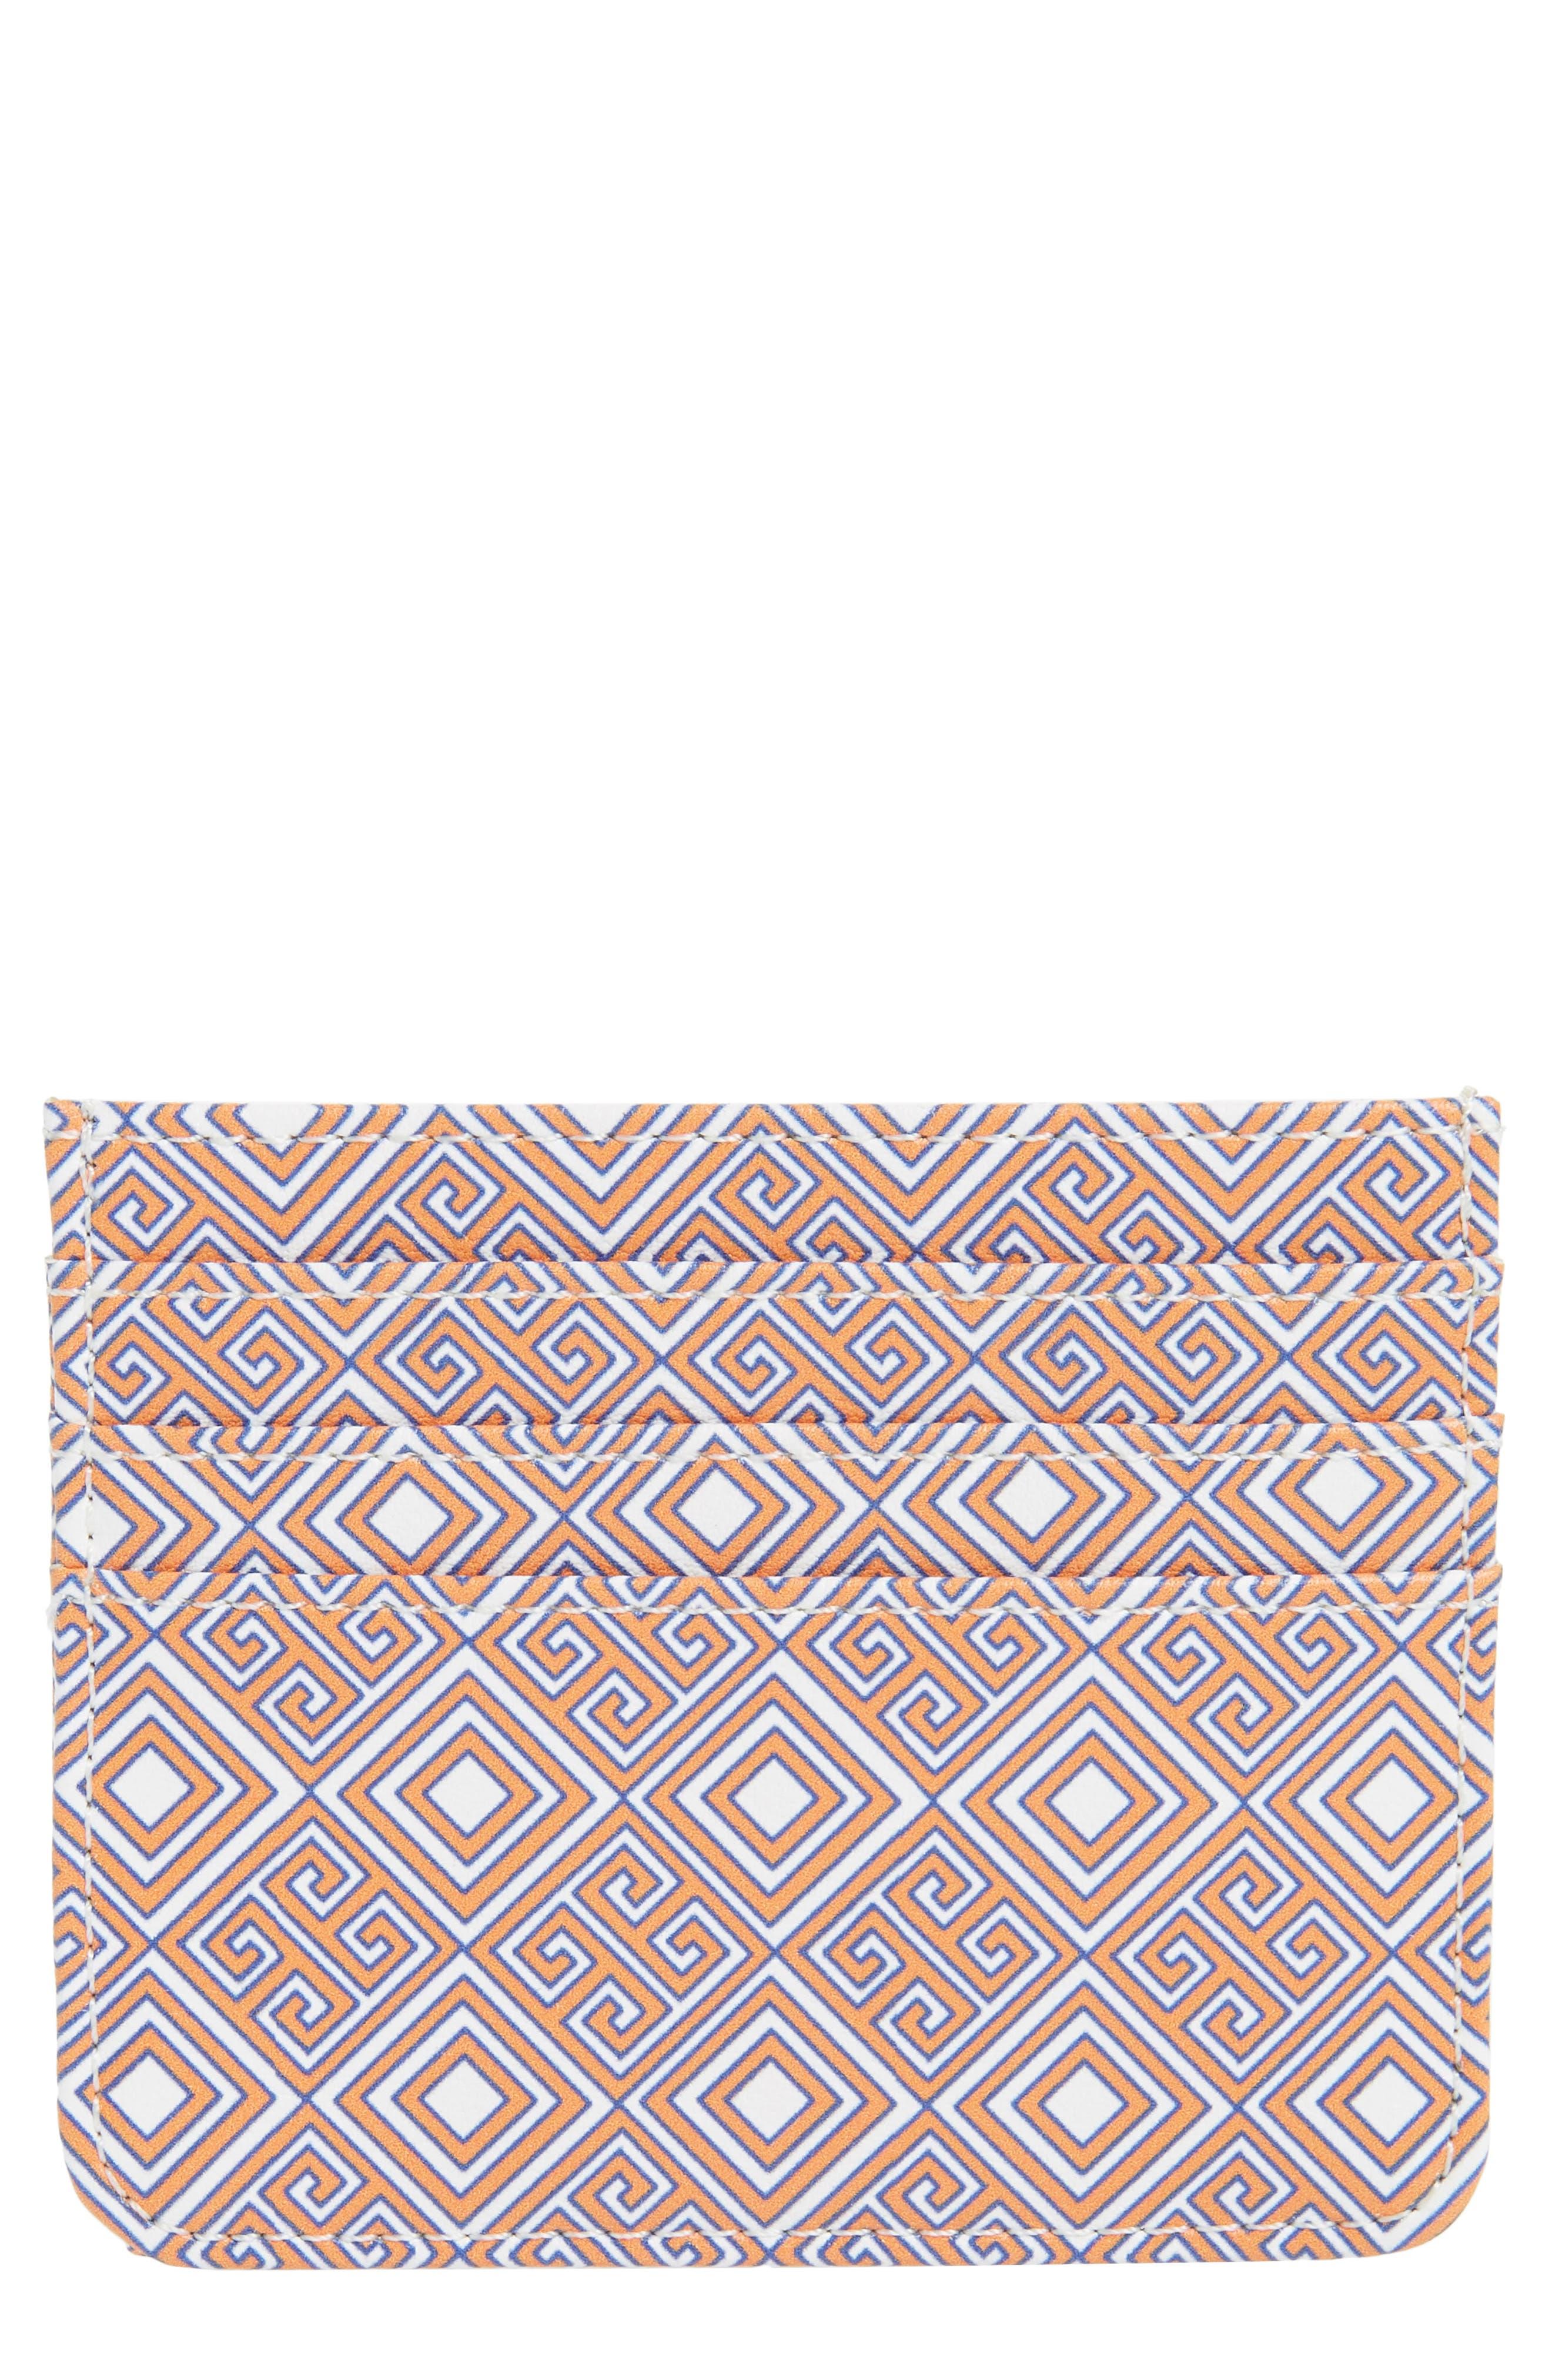 Faux Leather Card Case,                         Main,                         color, 800